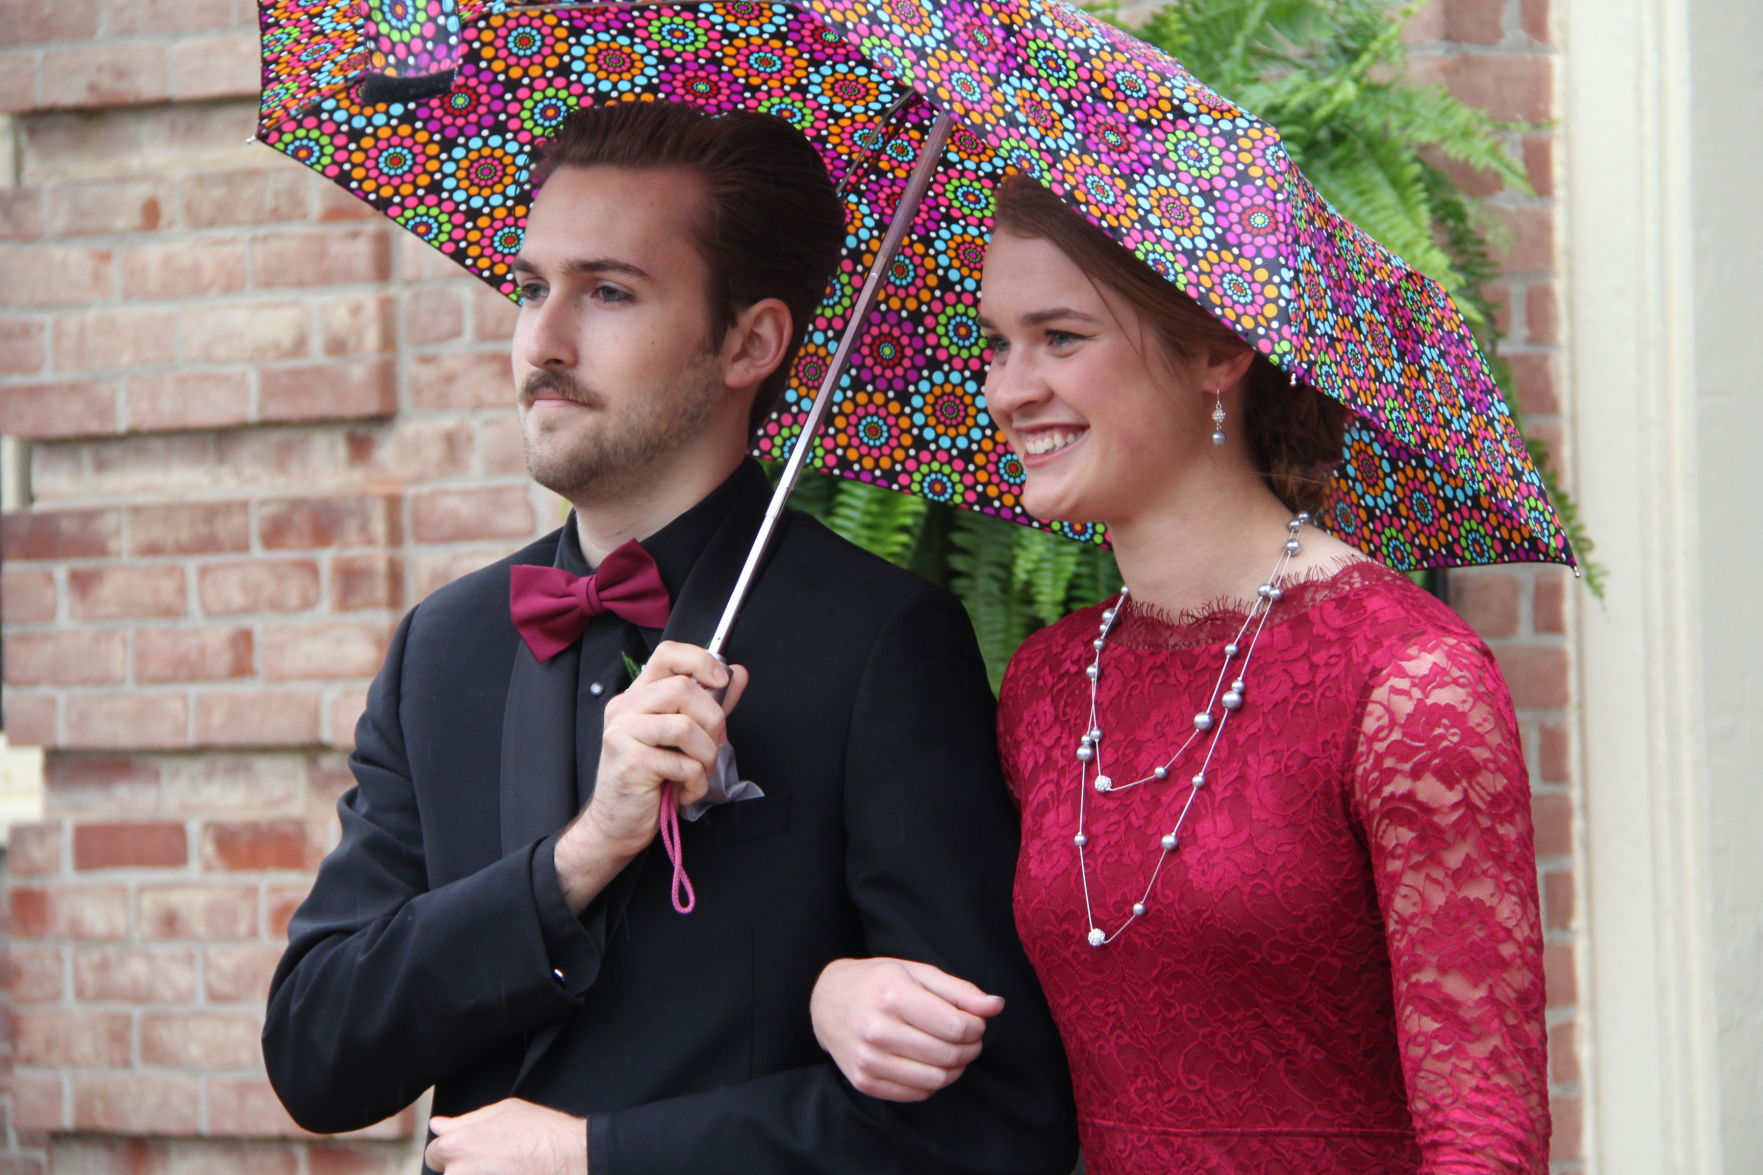 GALLERY: Mansfield Christian High School Prom 2019